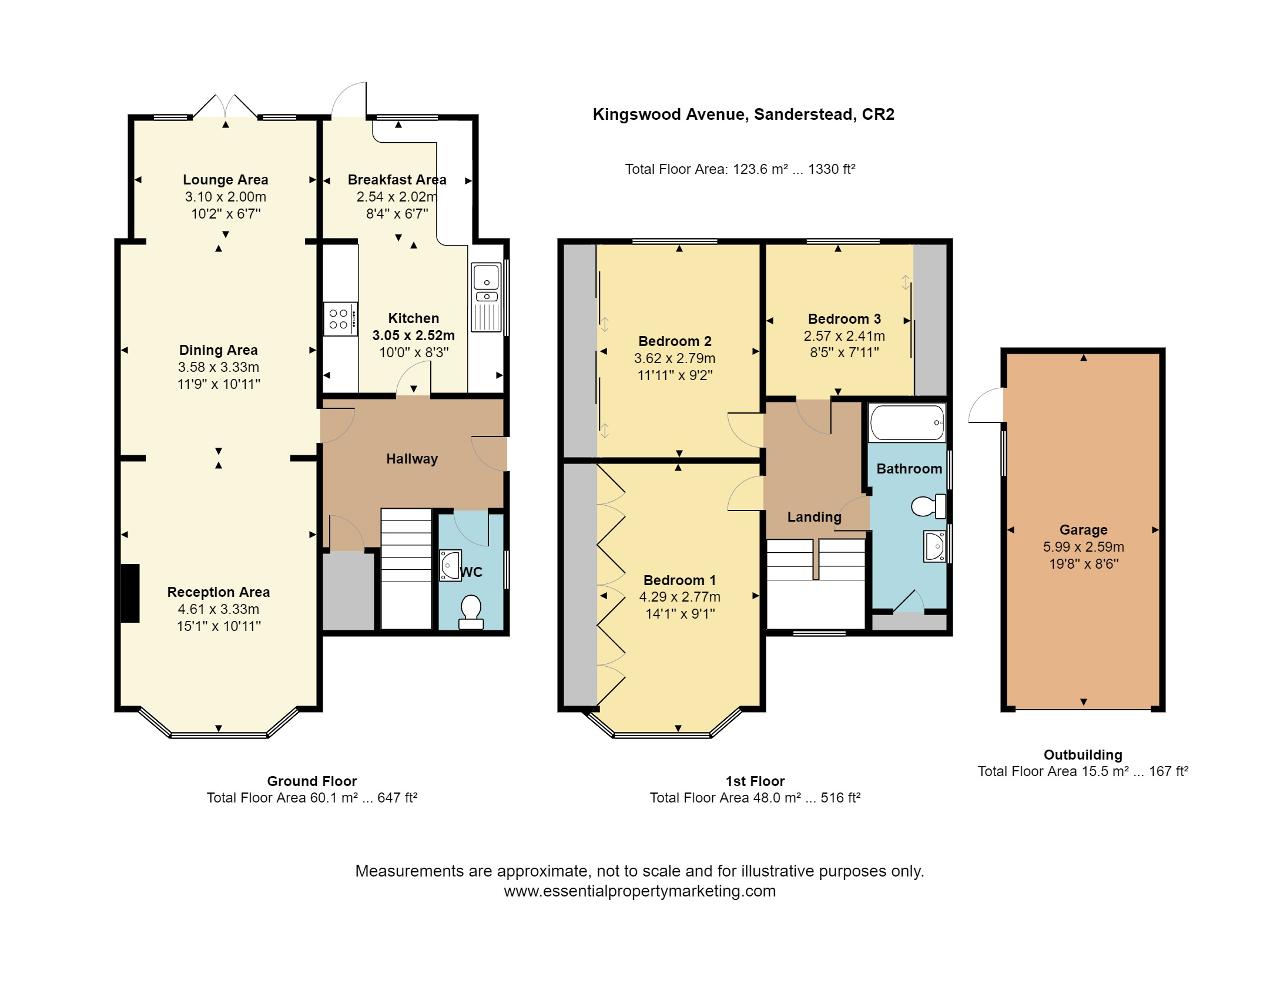 Floorplan of Kingswood Avenue, Sanderstead, South Croydon, CR2 9DQ